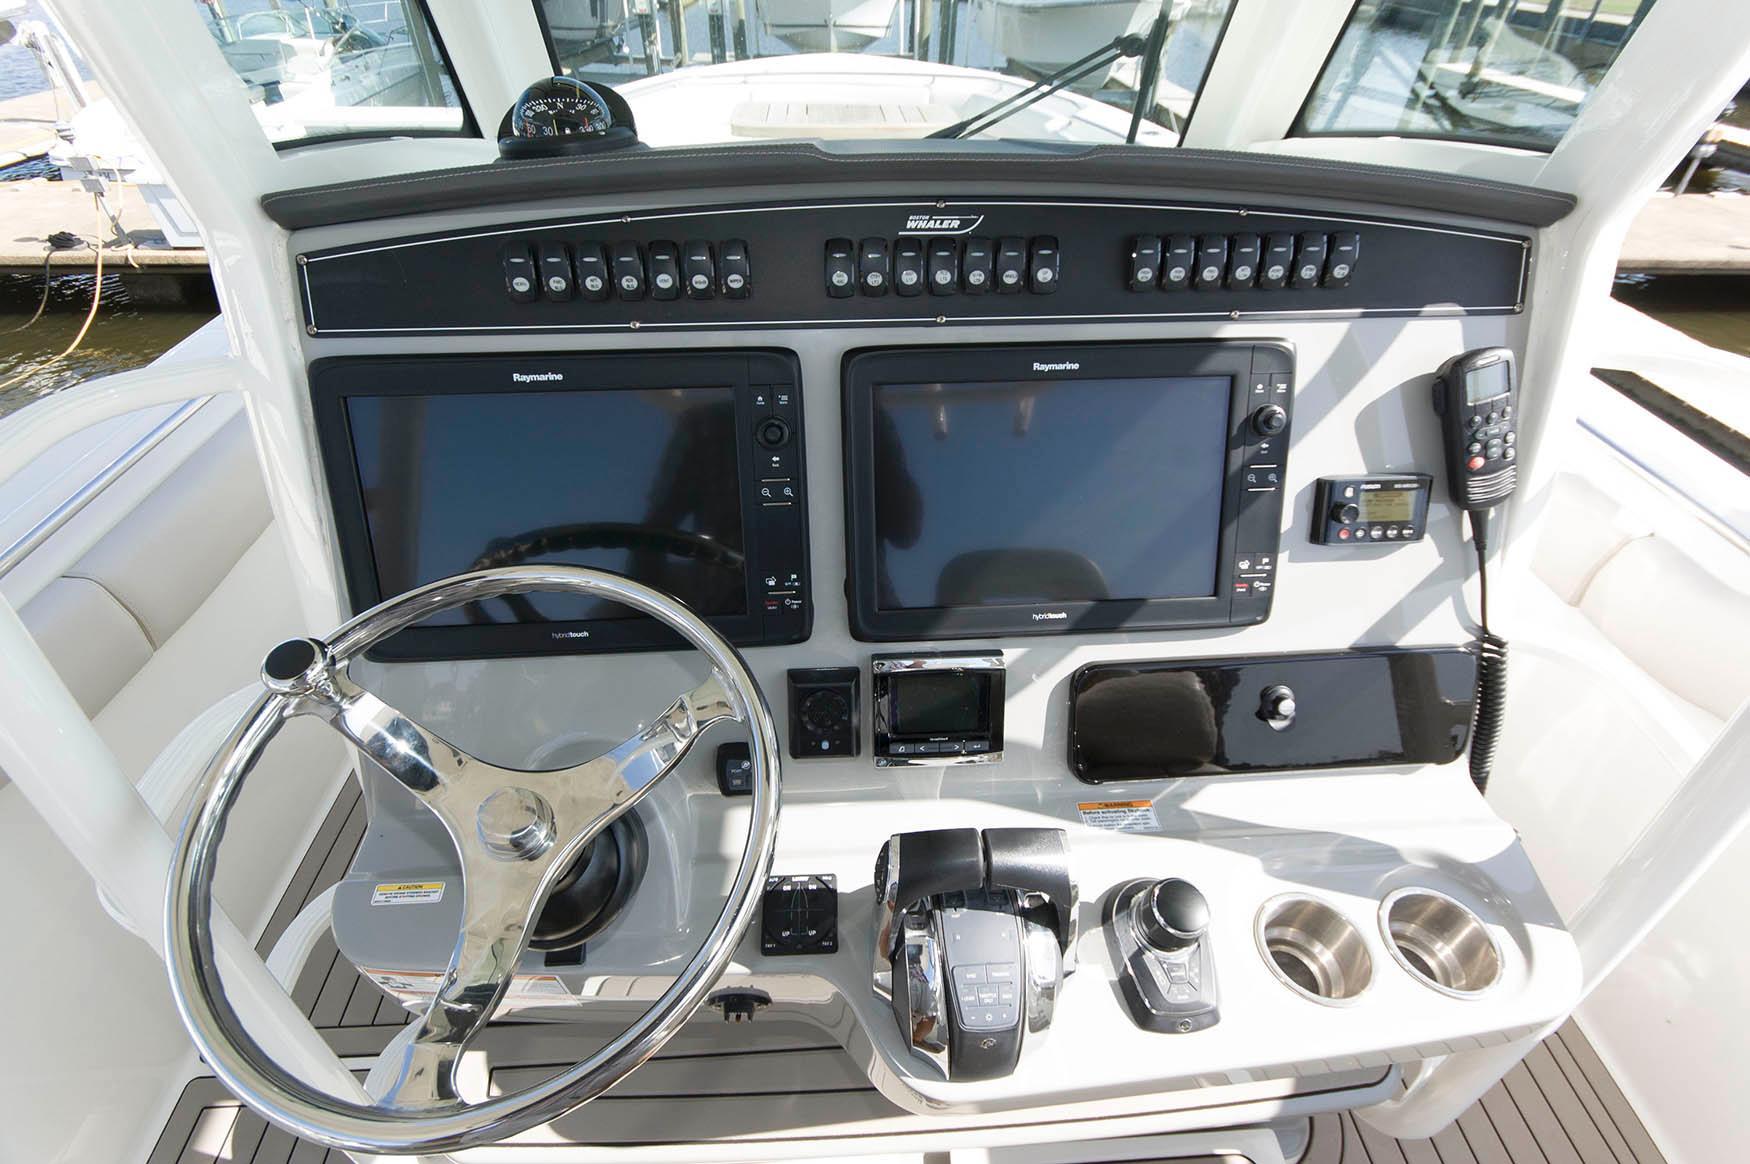 M 5688 JB Knot 10 Yacht Sales